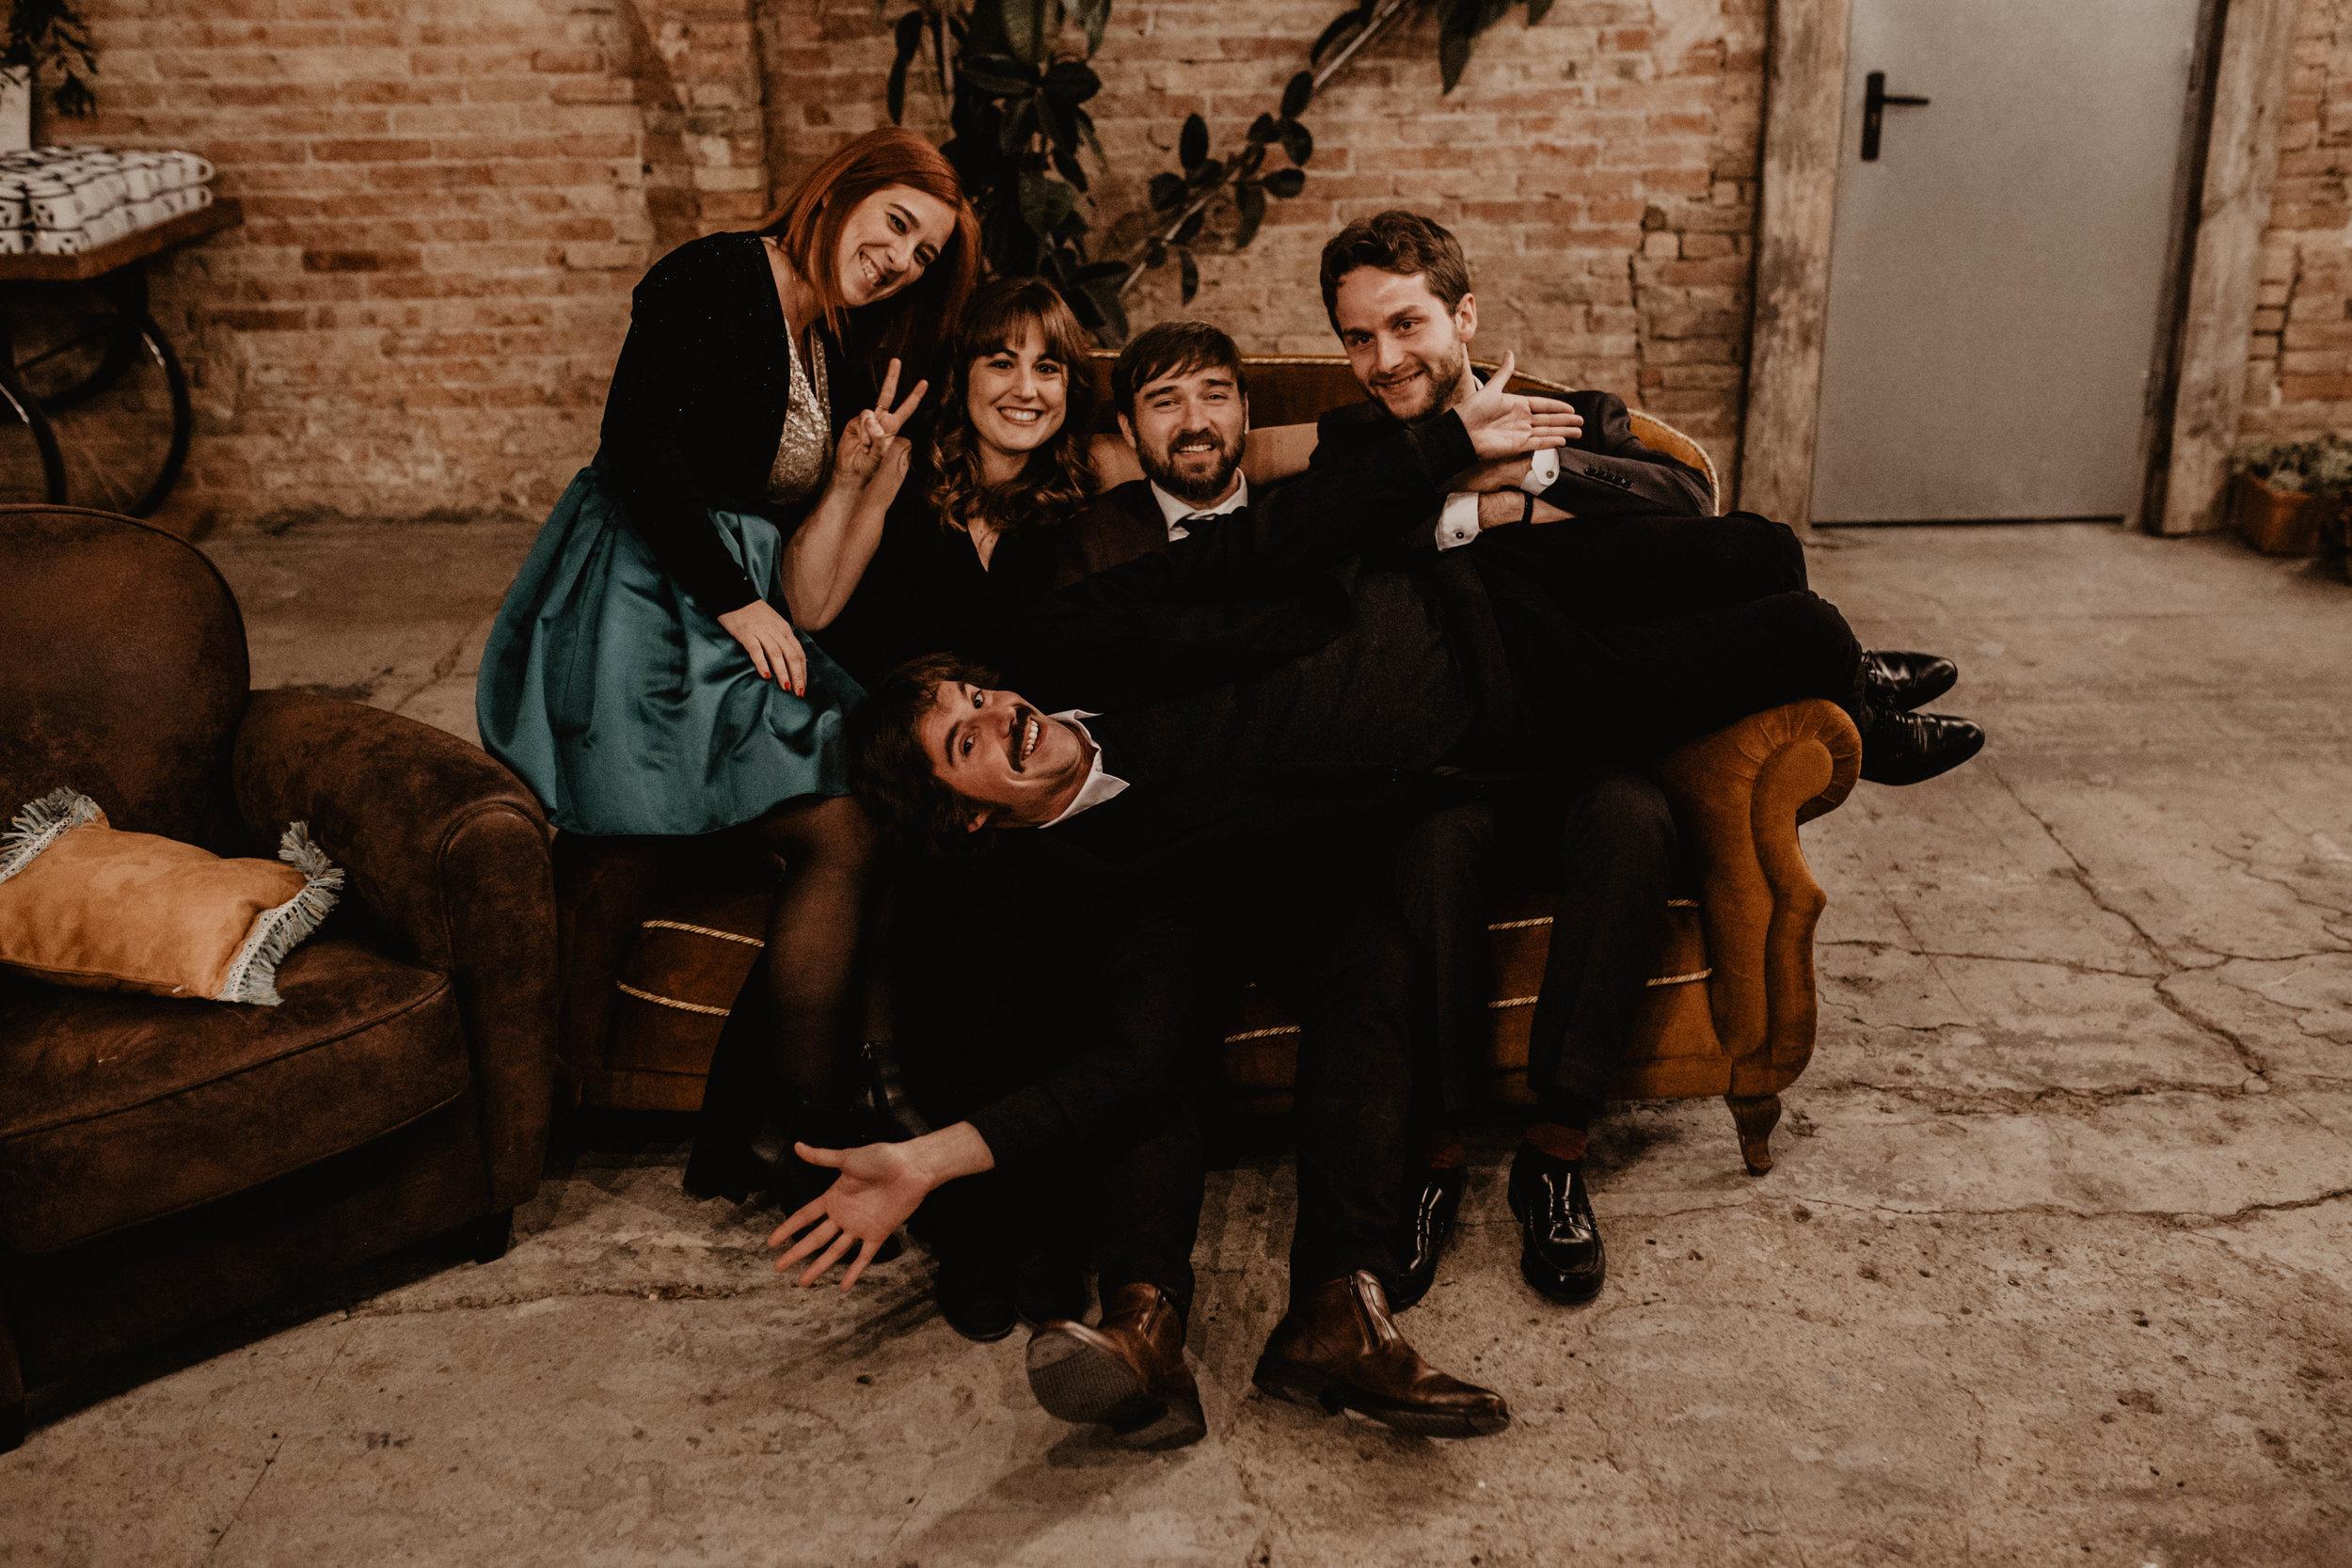 thenortherngirlphotography-photography-weddingphotography-couple-bodasconestilo-bodasenbarcelona-martadavid-1403.jpg